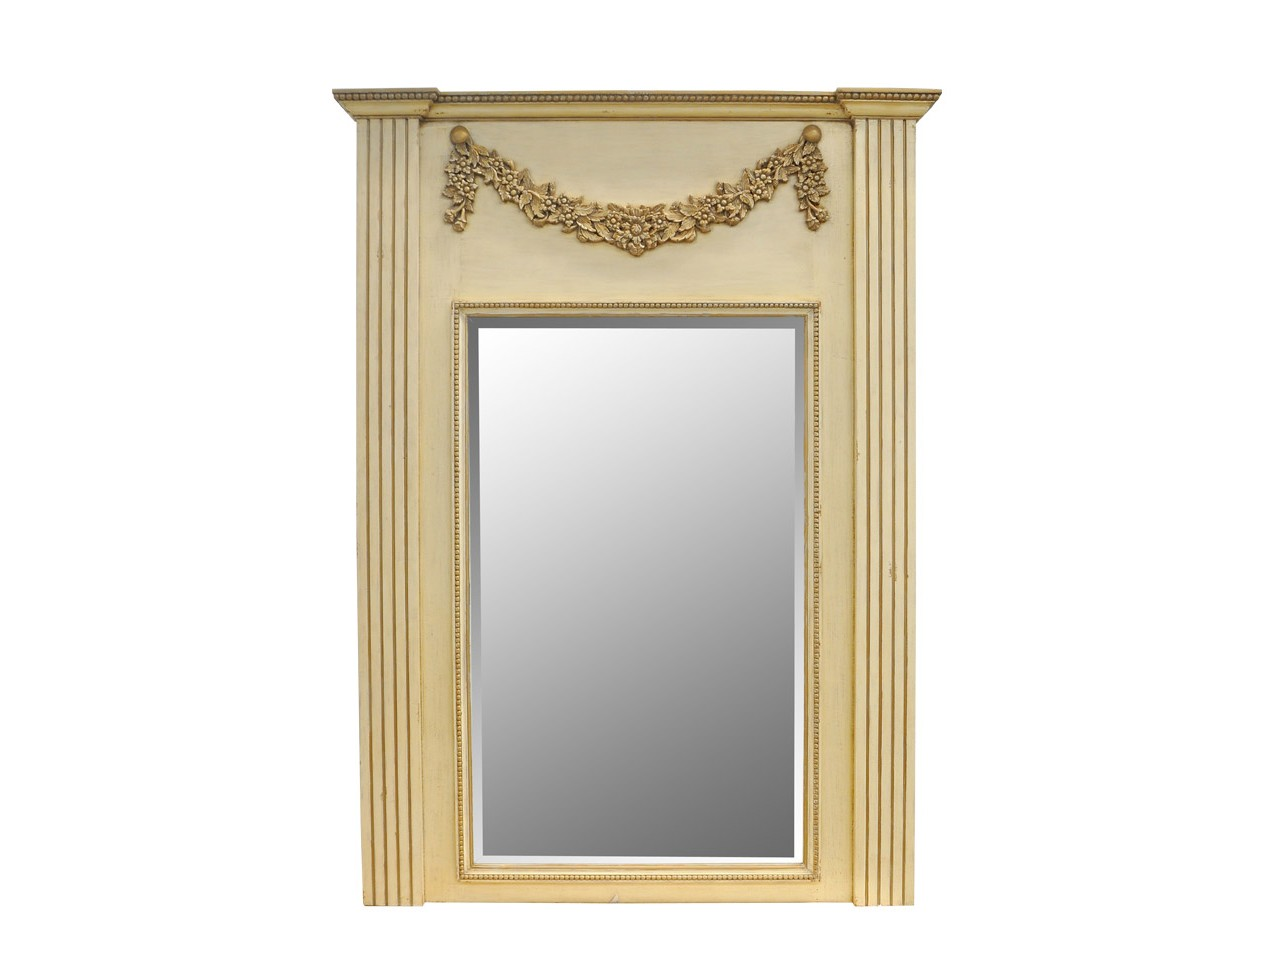 Зеркало AmberНастенные зеркала<br><br><br>Material: Стекло<br>Ширина см: 147<br>Высота см: 200<br>Глубина см: 13